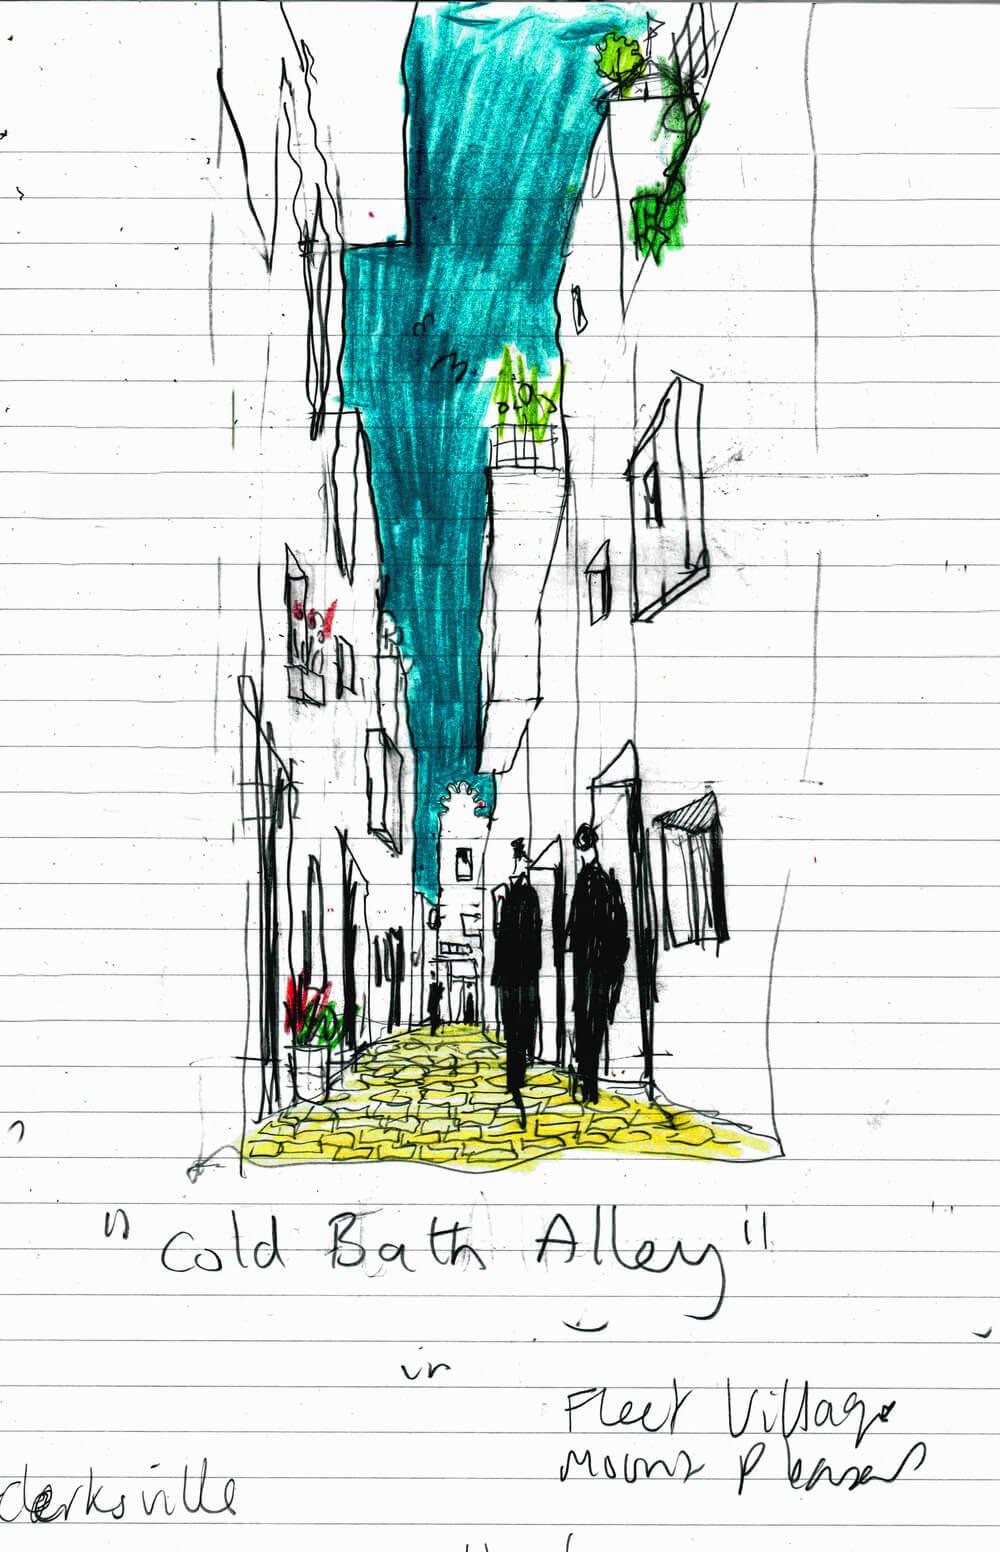 Coldbath+Alley+Colour.jpg